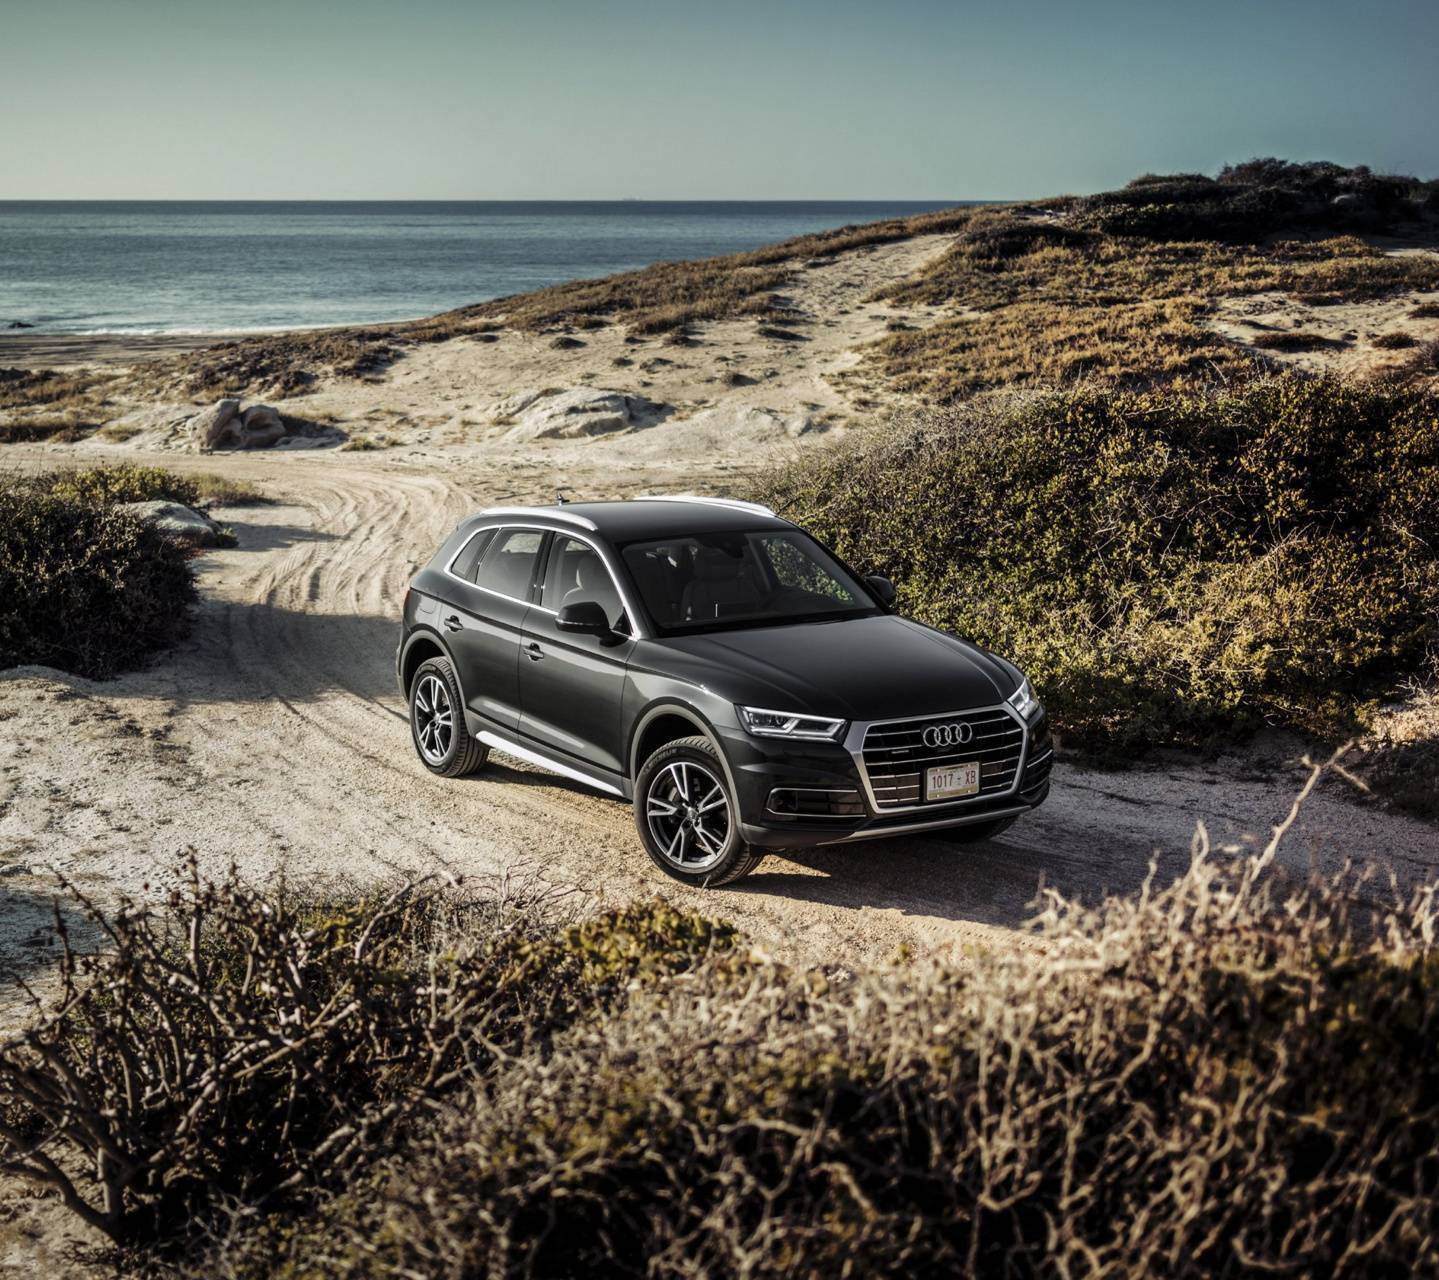 Audi Q5 Wallpaper By Xhanirm C5 Free On Zedge